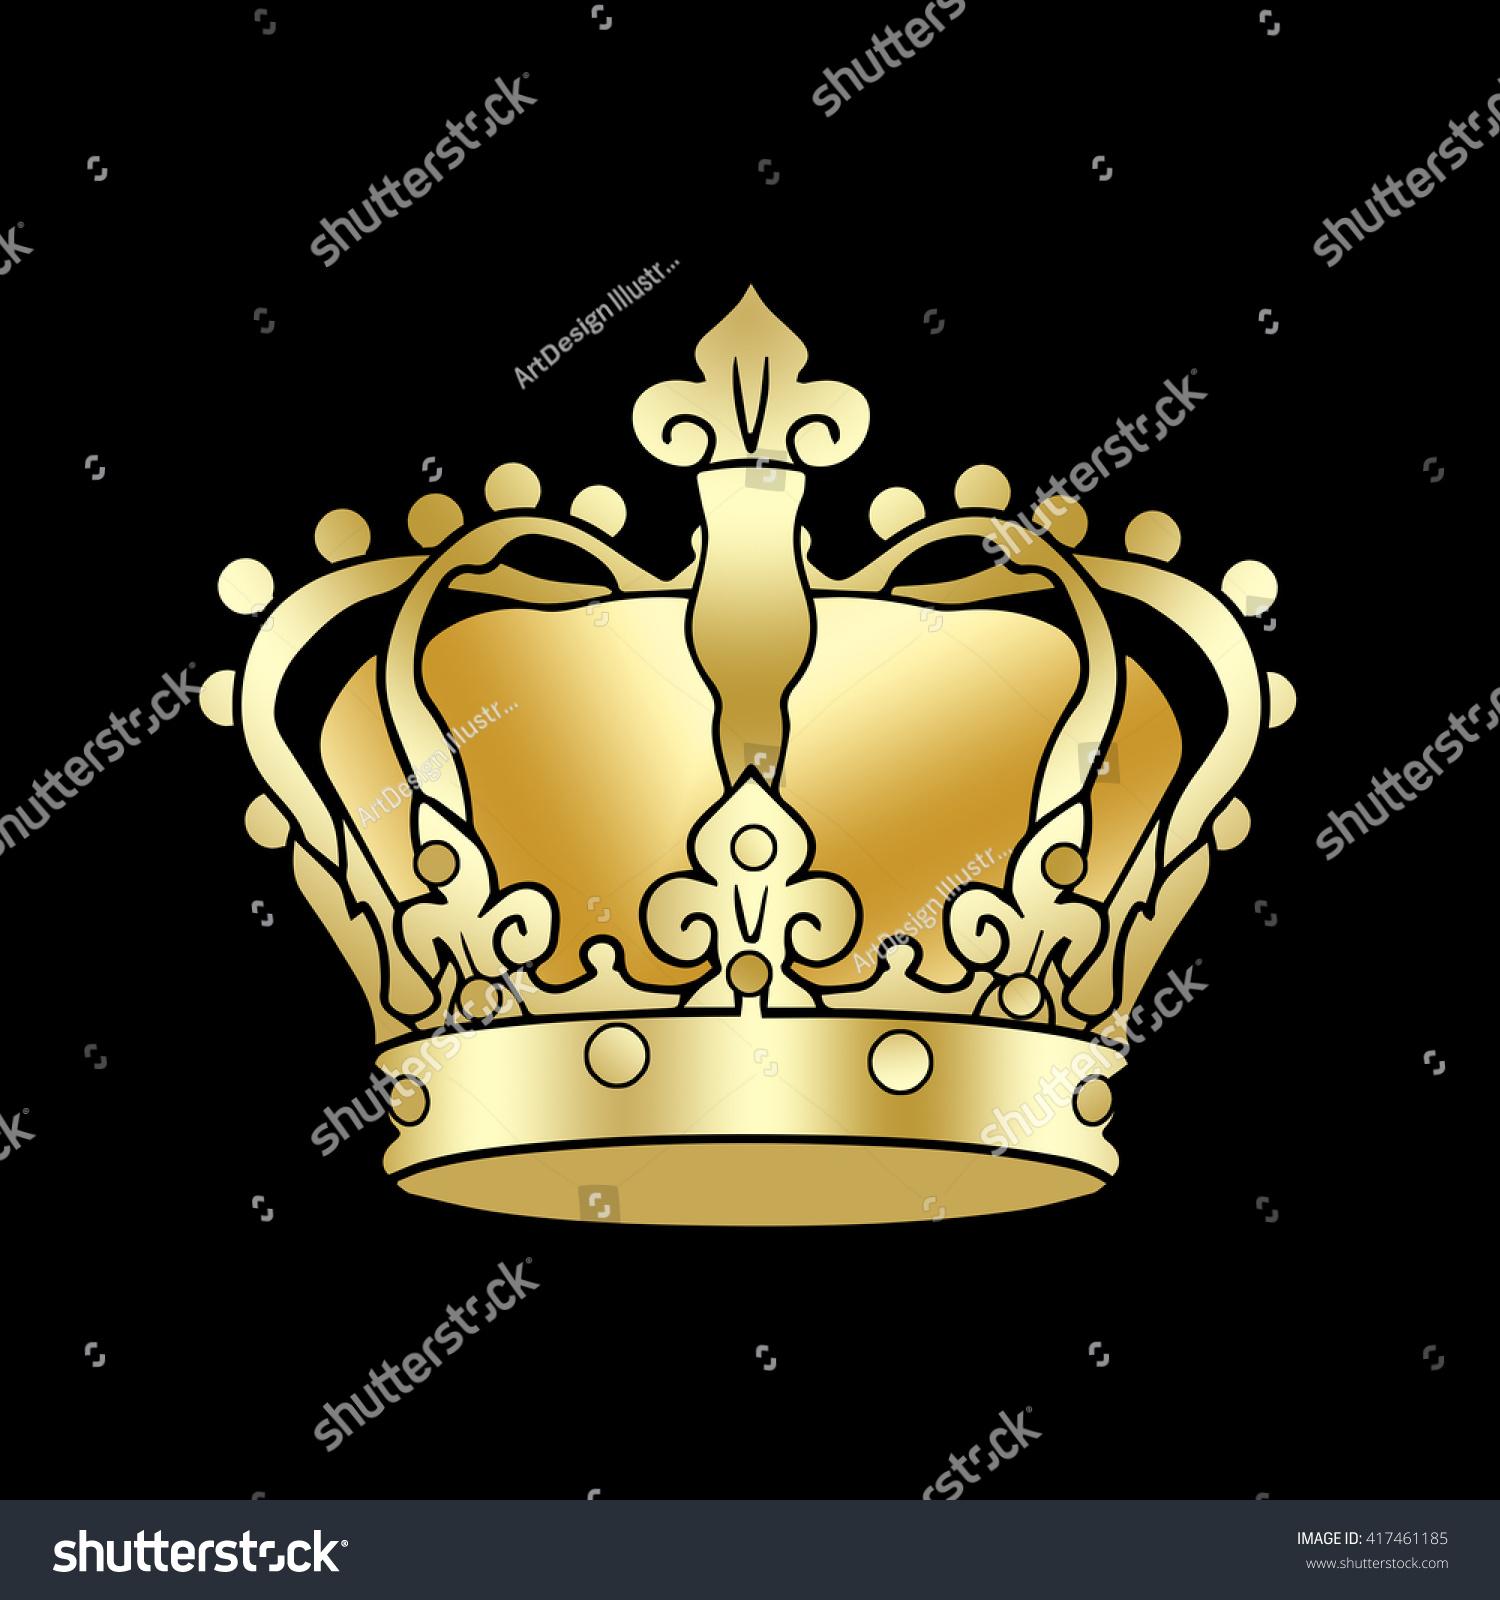 Royalty Free Crown Symbol Golden Crown King 417461185 Stock Photo